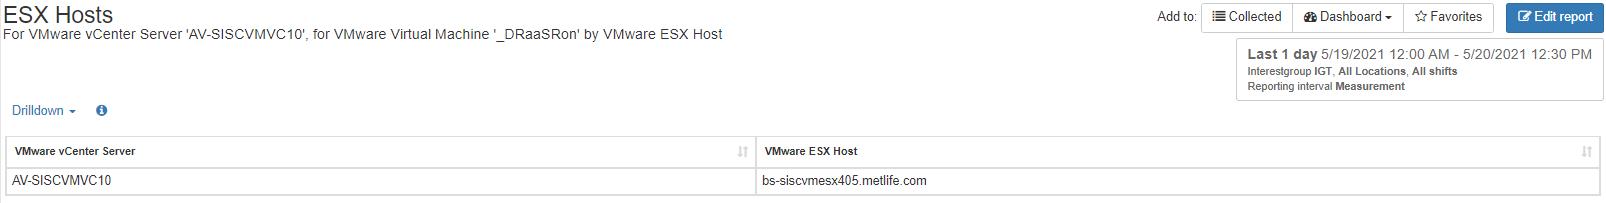 Current ESX Host